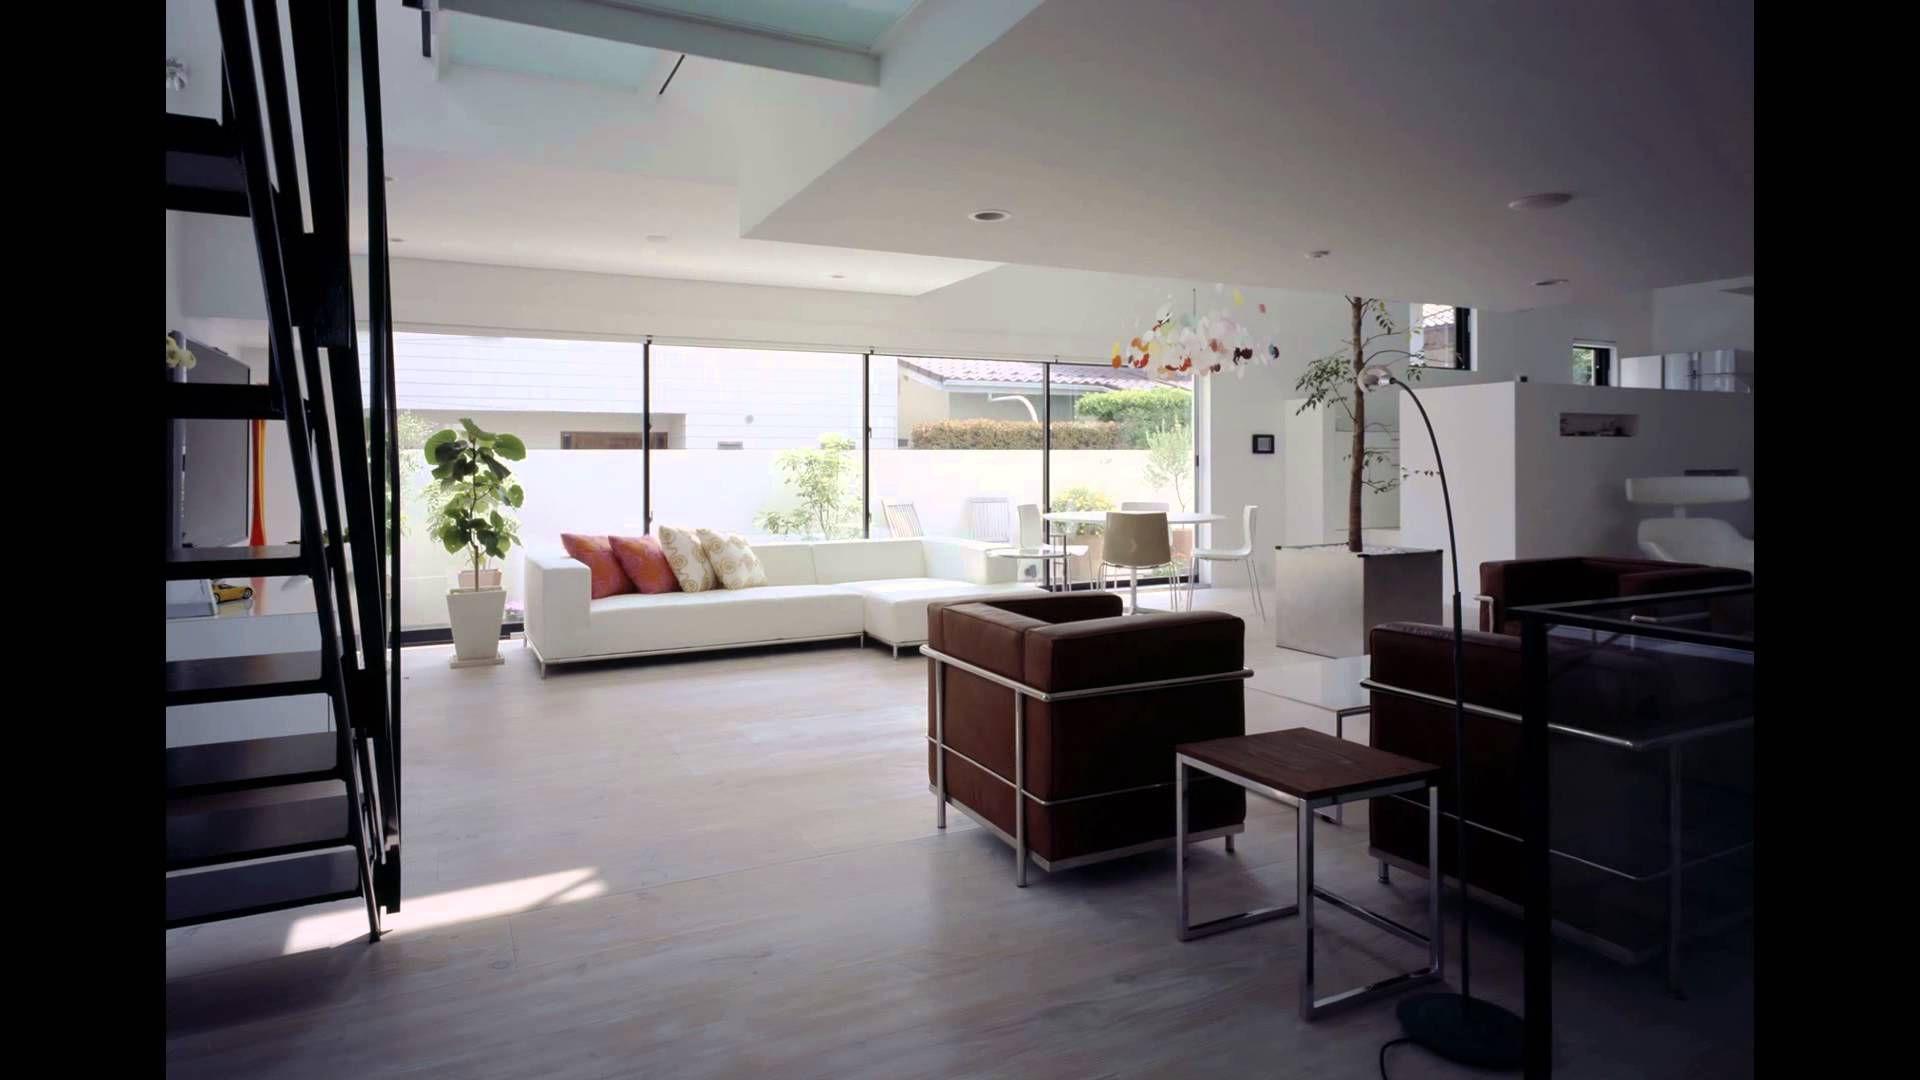 Convert Garage into Office Design and Ideas Concept ...